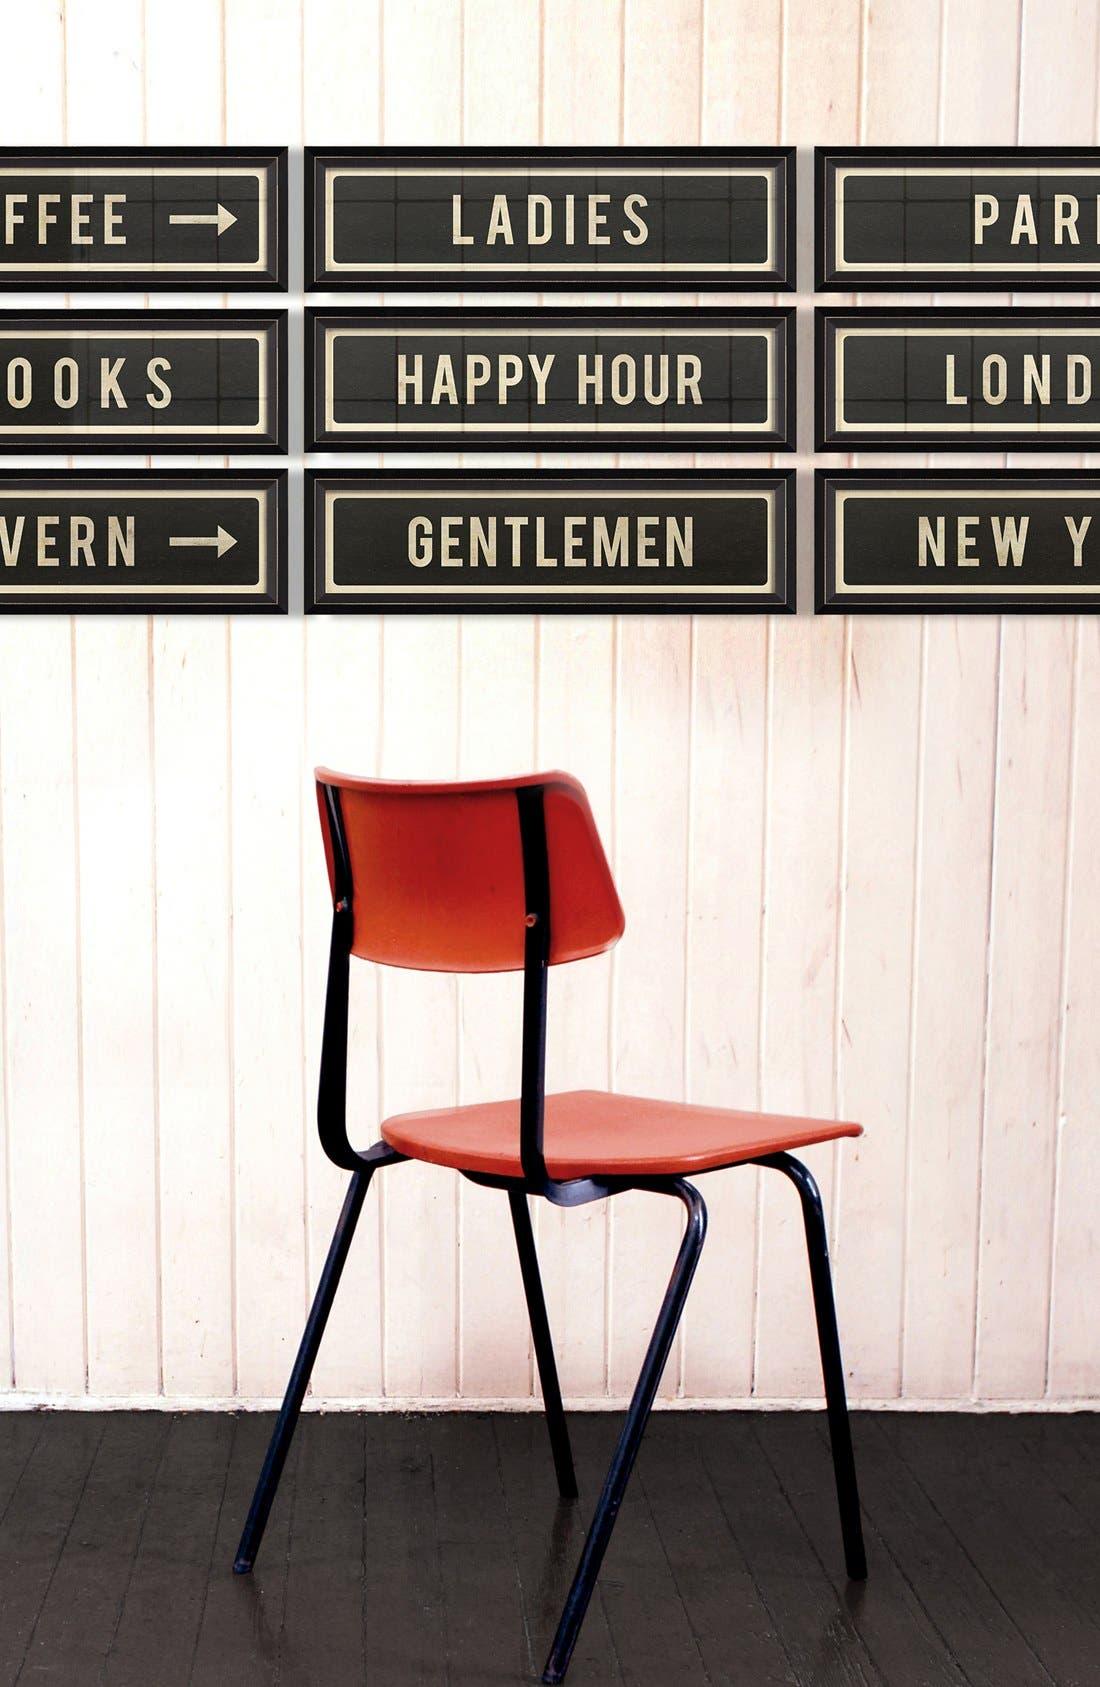 'Happy Hour' Vintage Look Street Sign Artwork,                             Alternate thumbnail 3, color,                             001